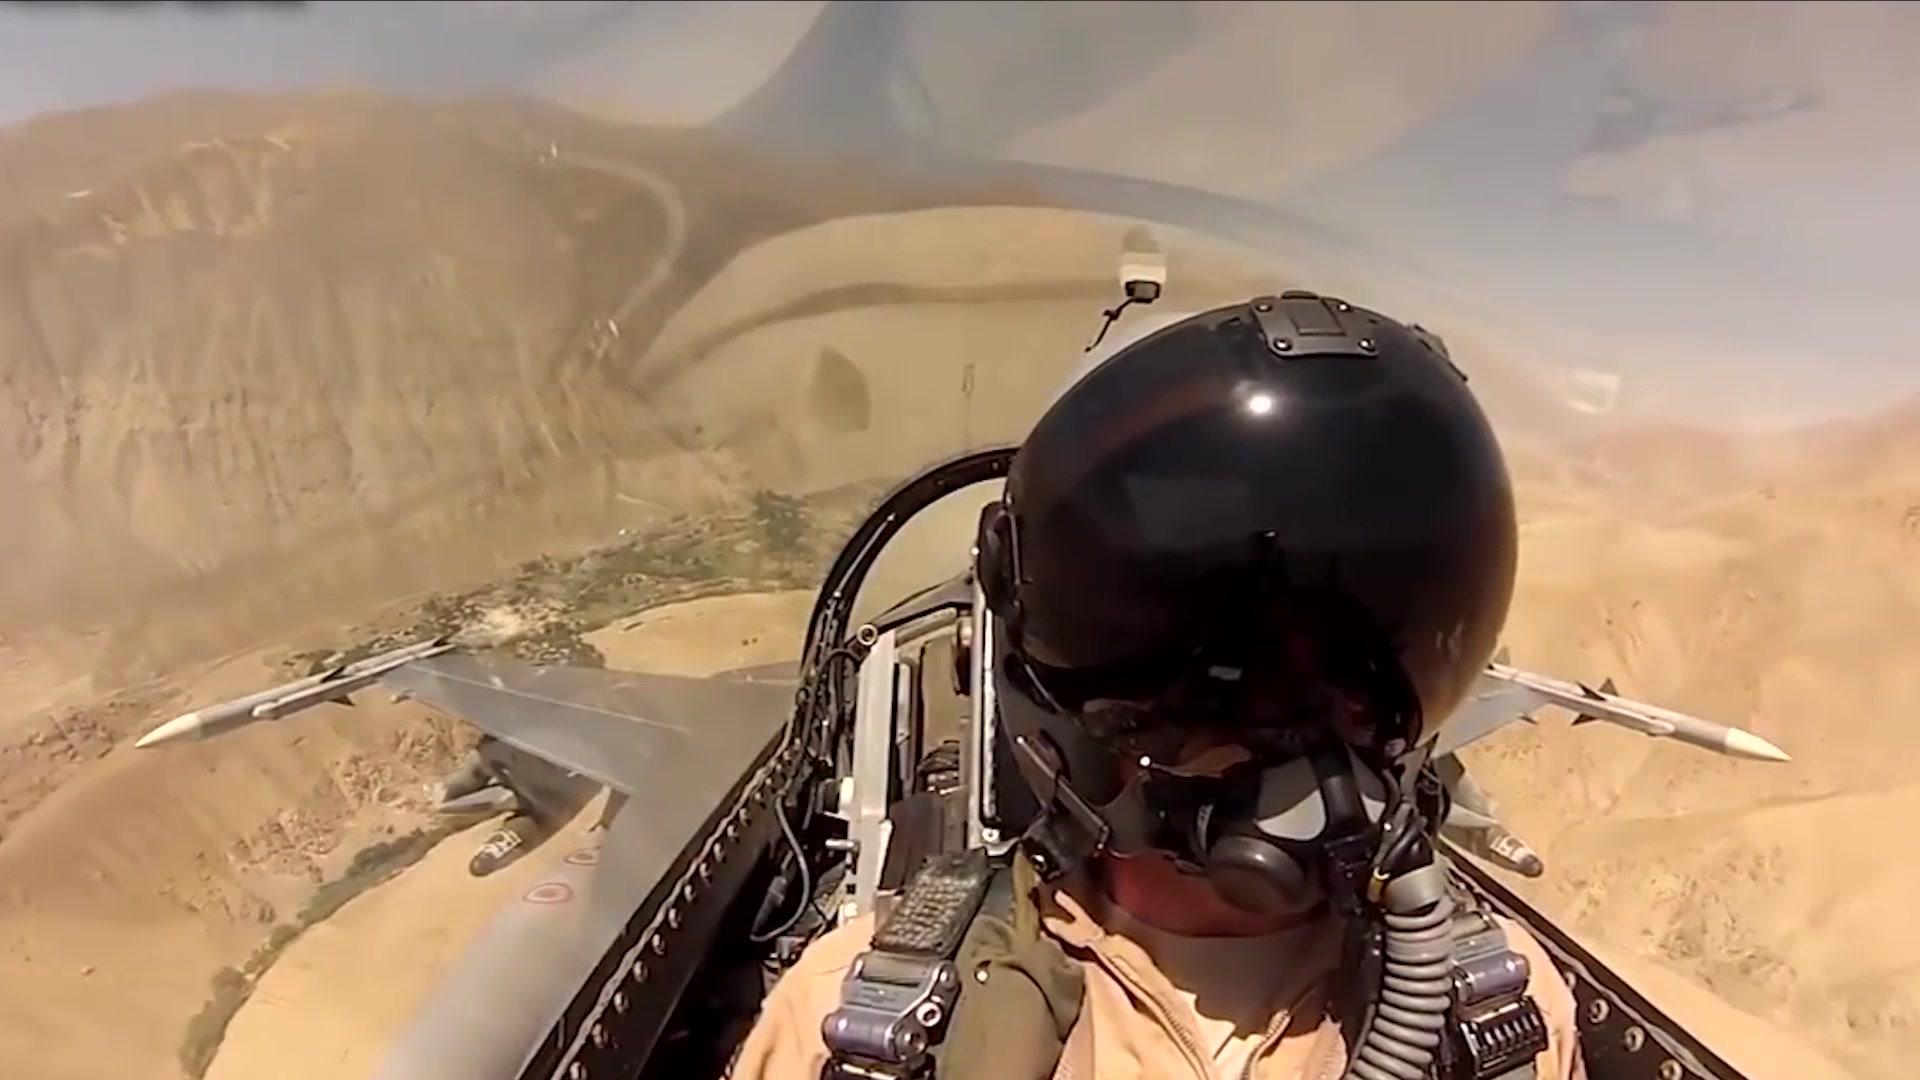 Air Force Reserve Commander, Lt. Gen. Richard Scobee talks about resiliency to Reserve Citizen Airmen